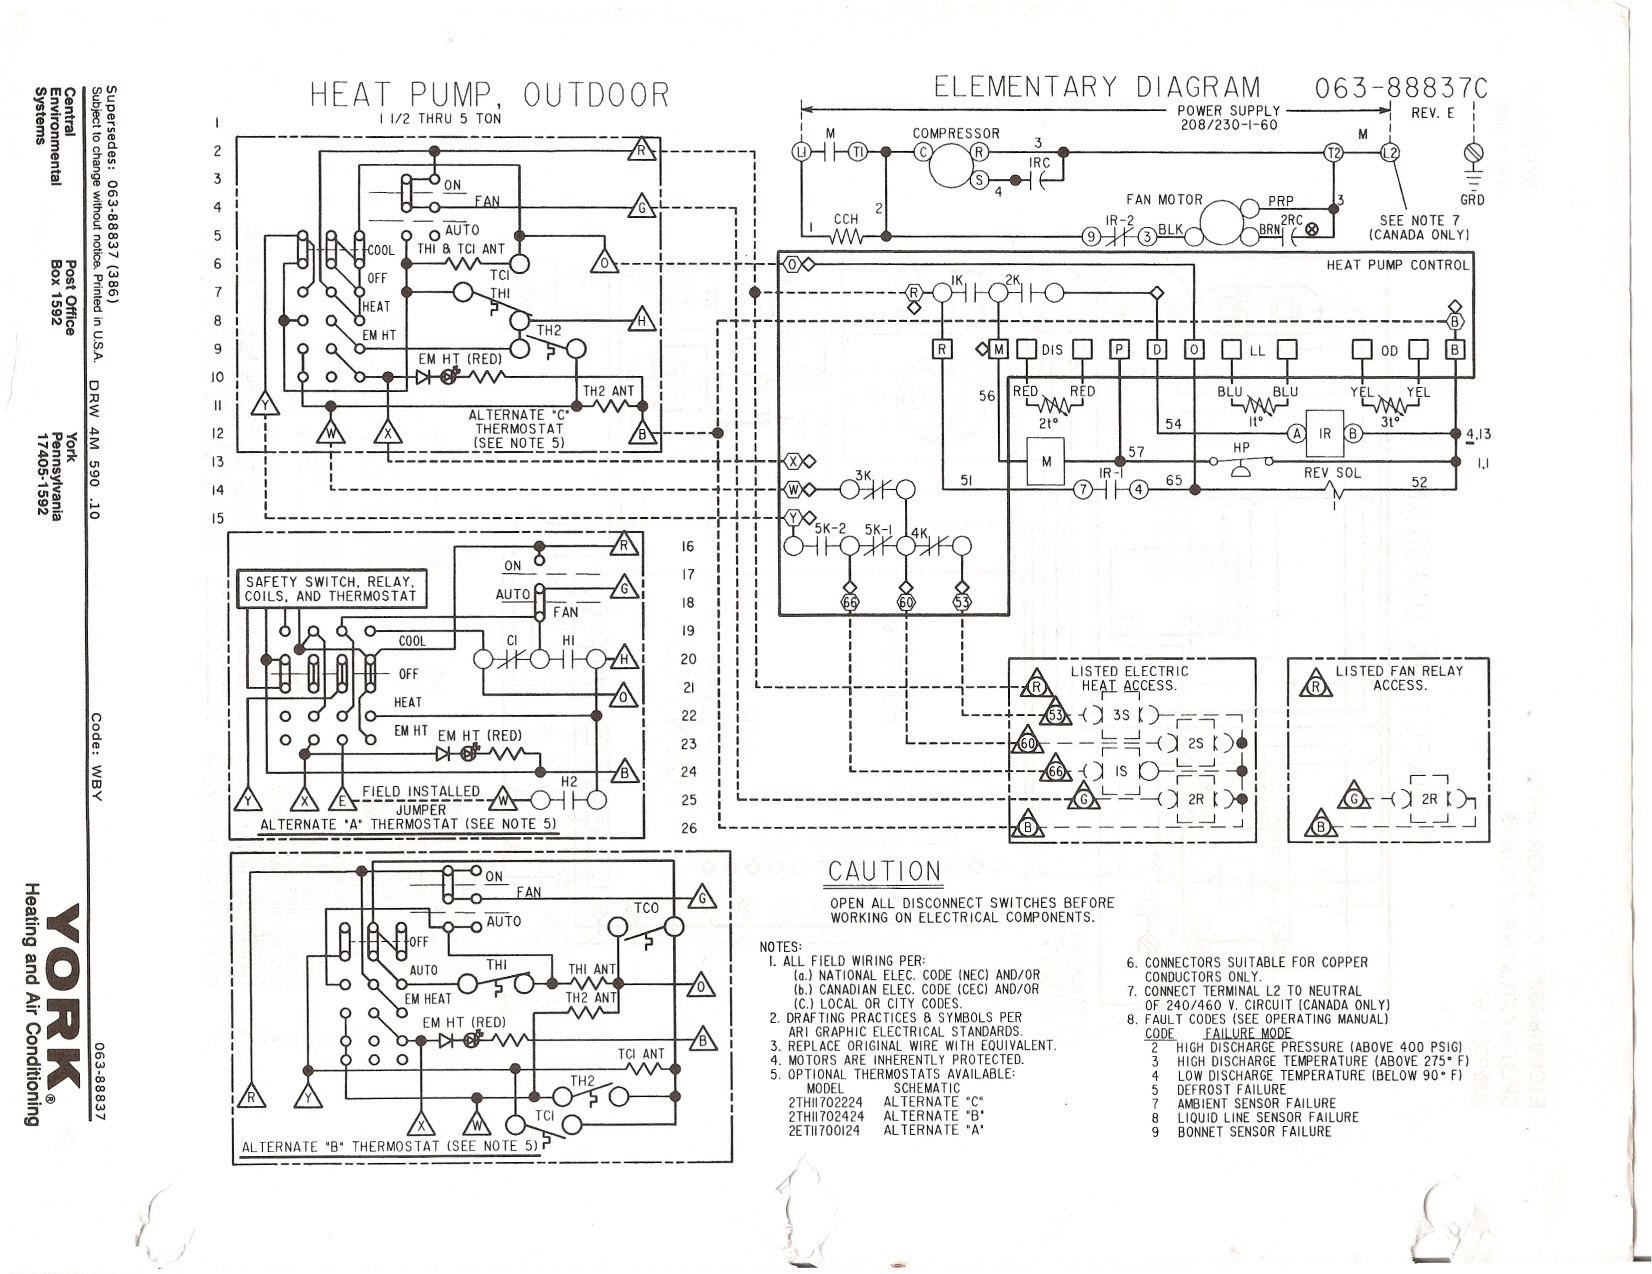 Goodman Air Handler To Heat Pump Wiring Diagram - Wiring Diagram Name - Goodman Air Handler Wiring Diagram